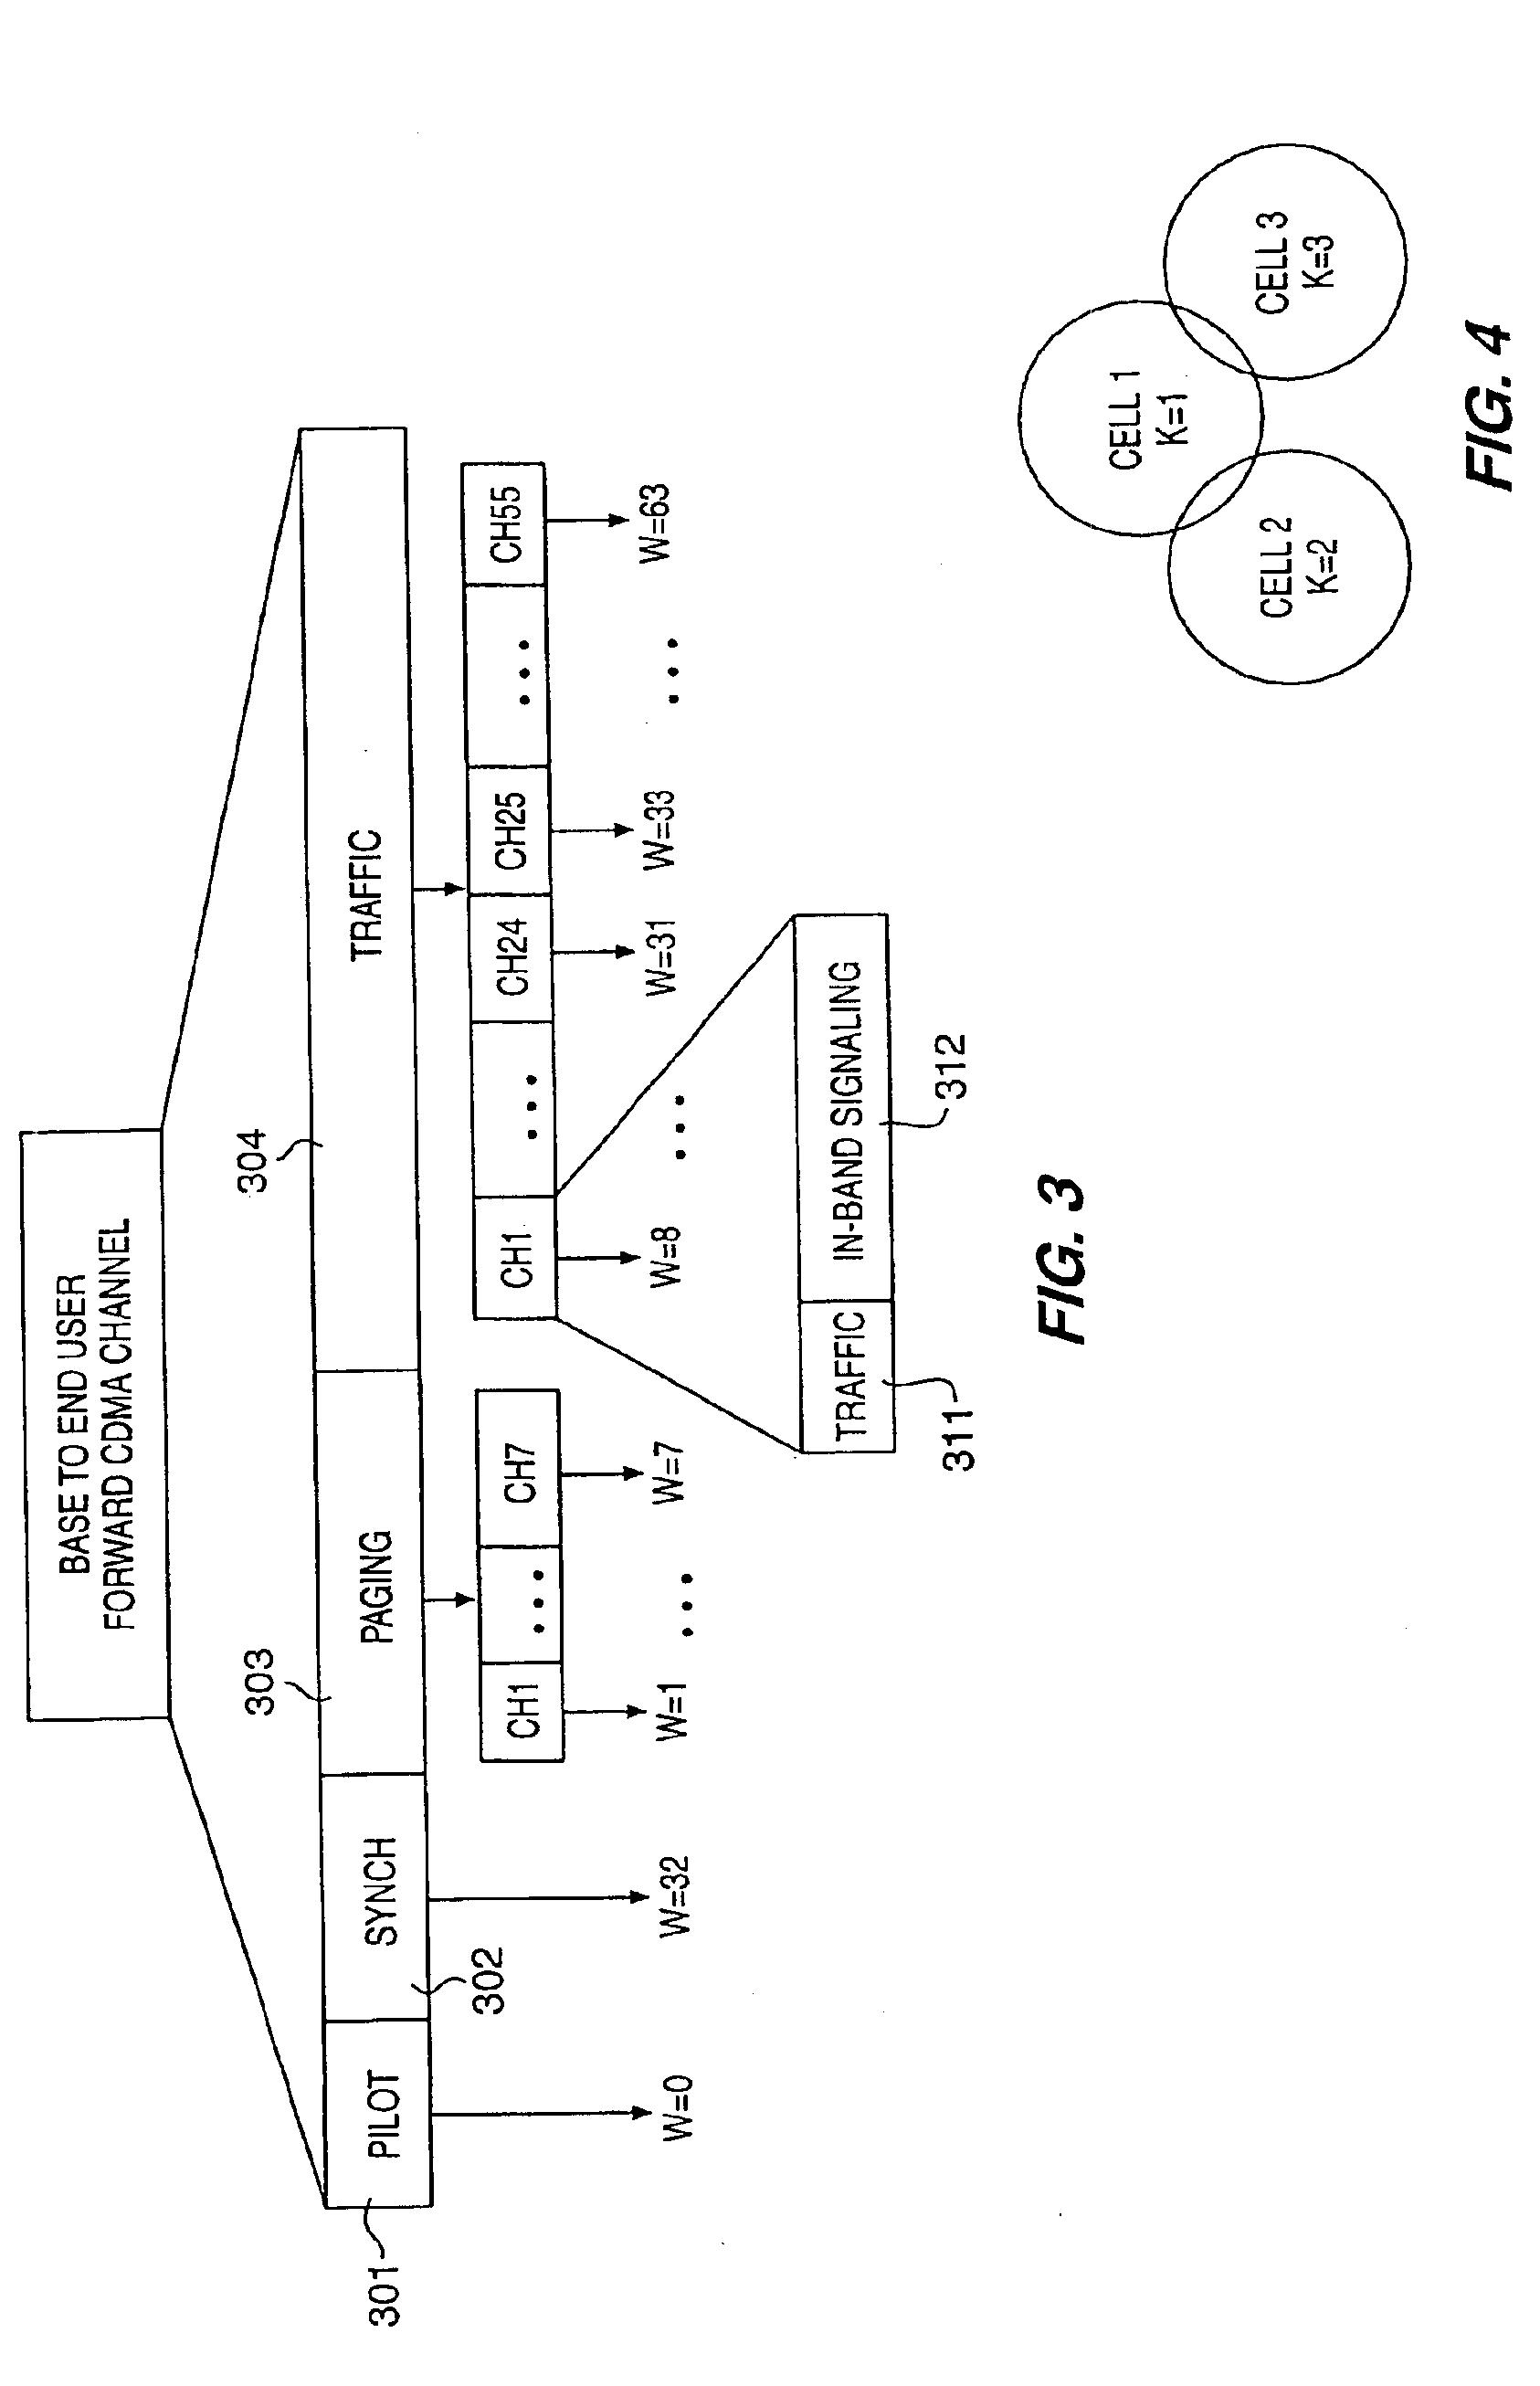 Patent US 6,954,641 B2